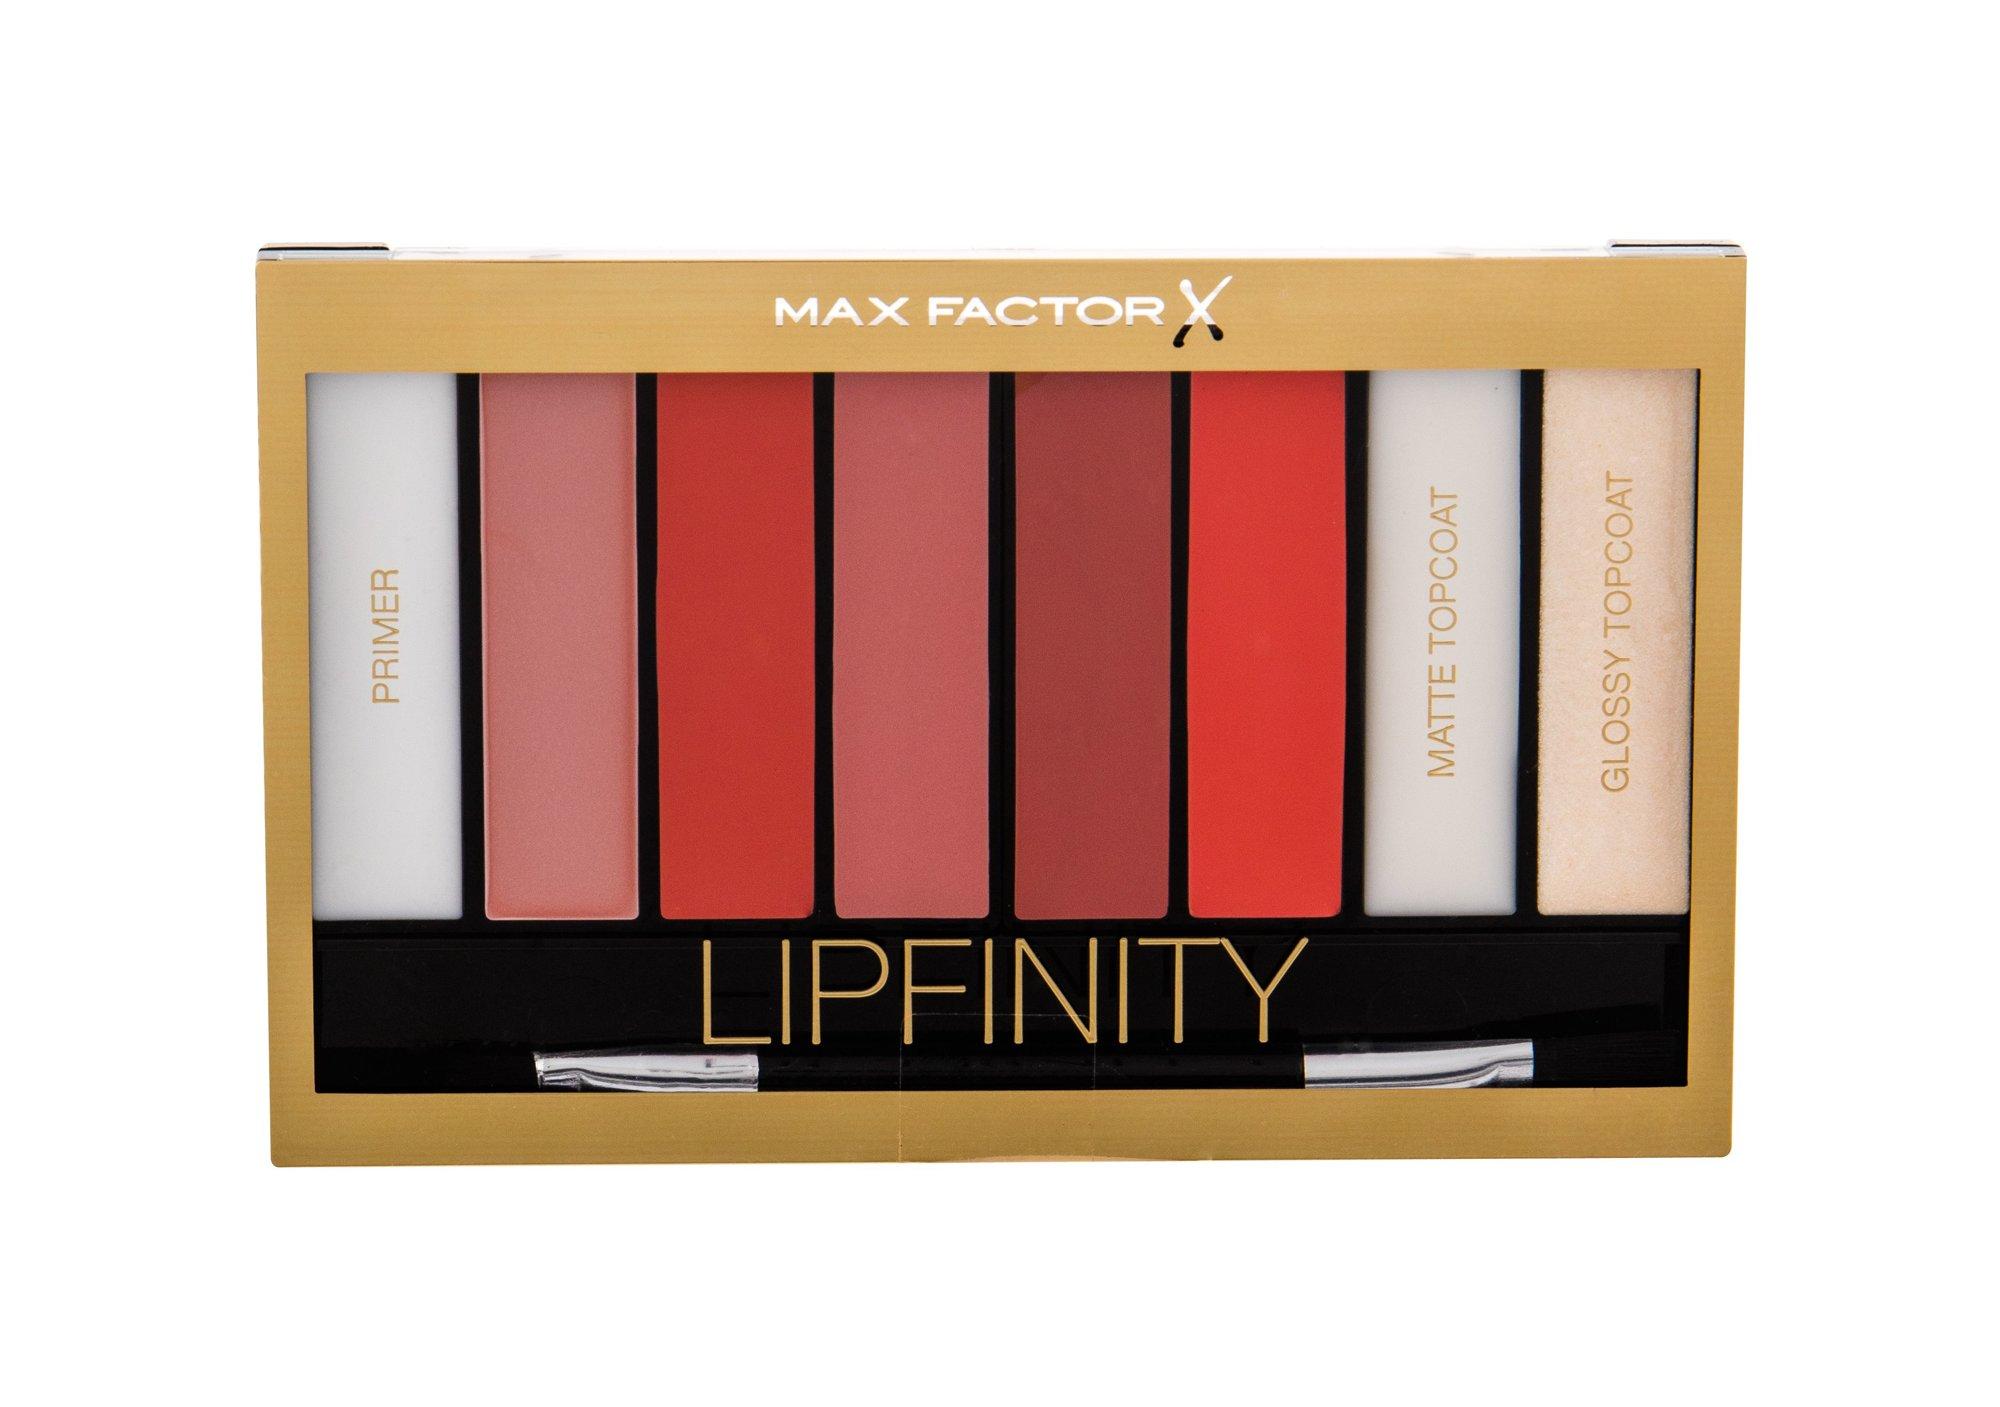 Max Factor Lipfinity Lipstick 12ml 03 Nudes